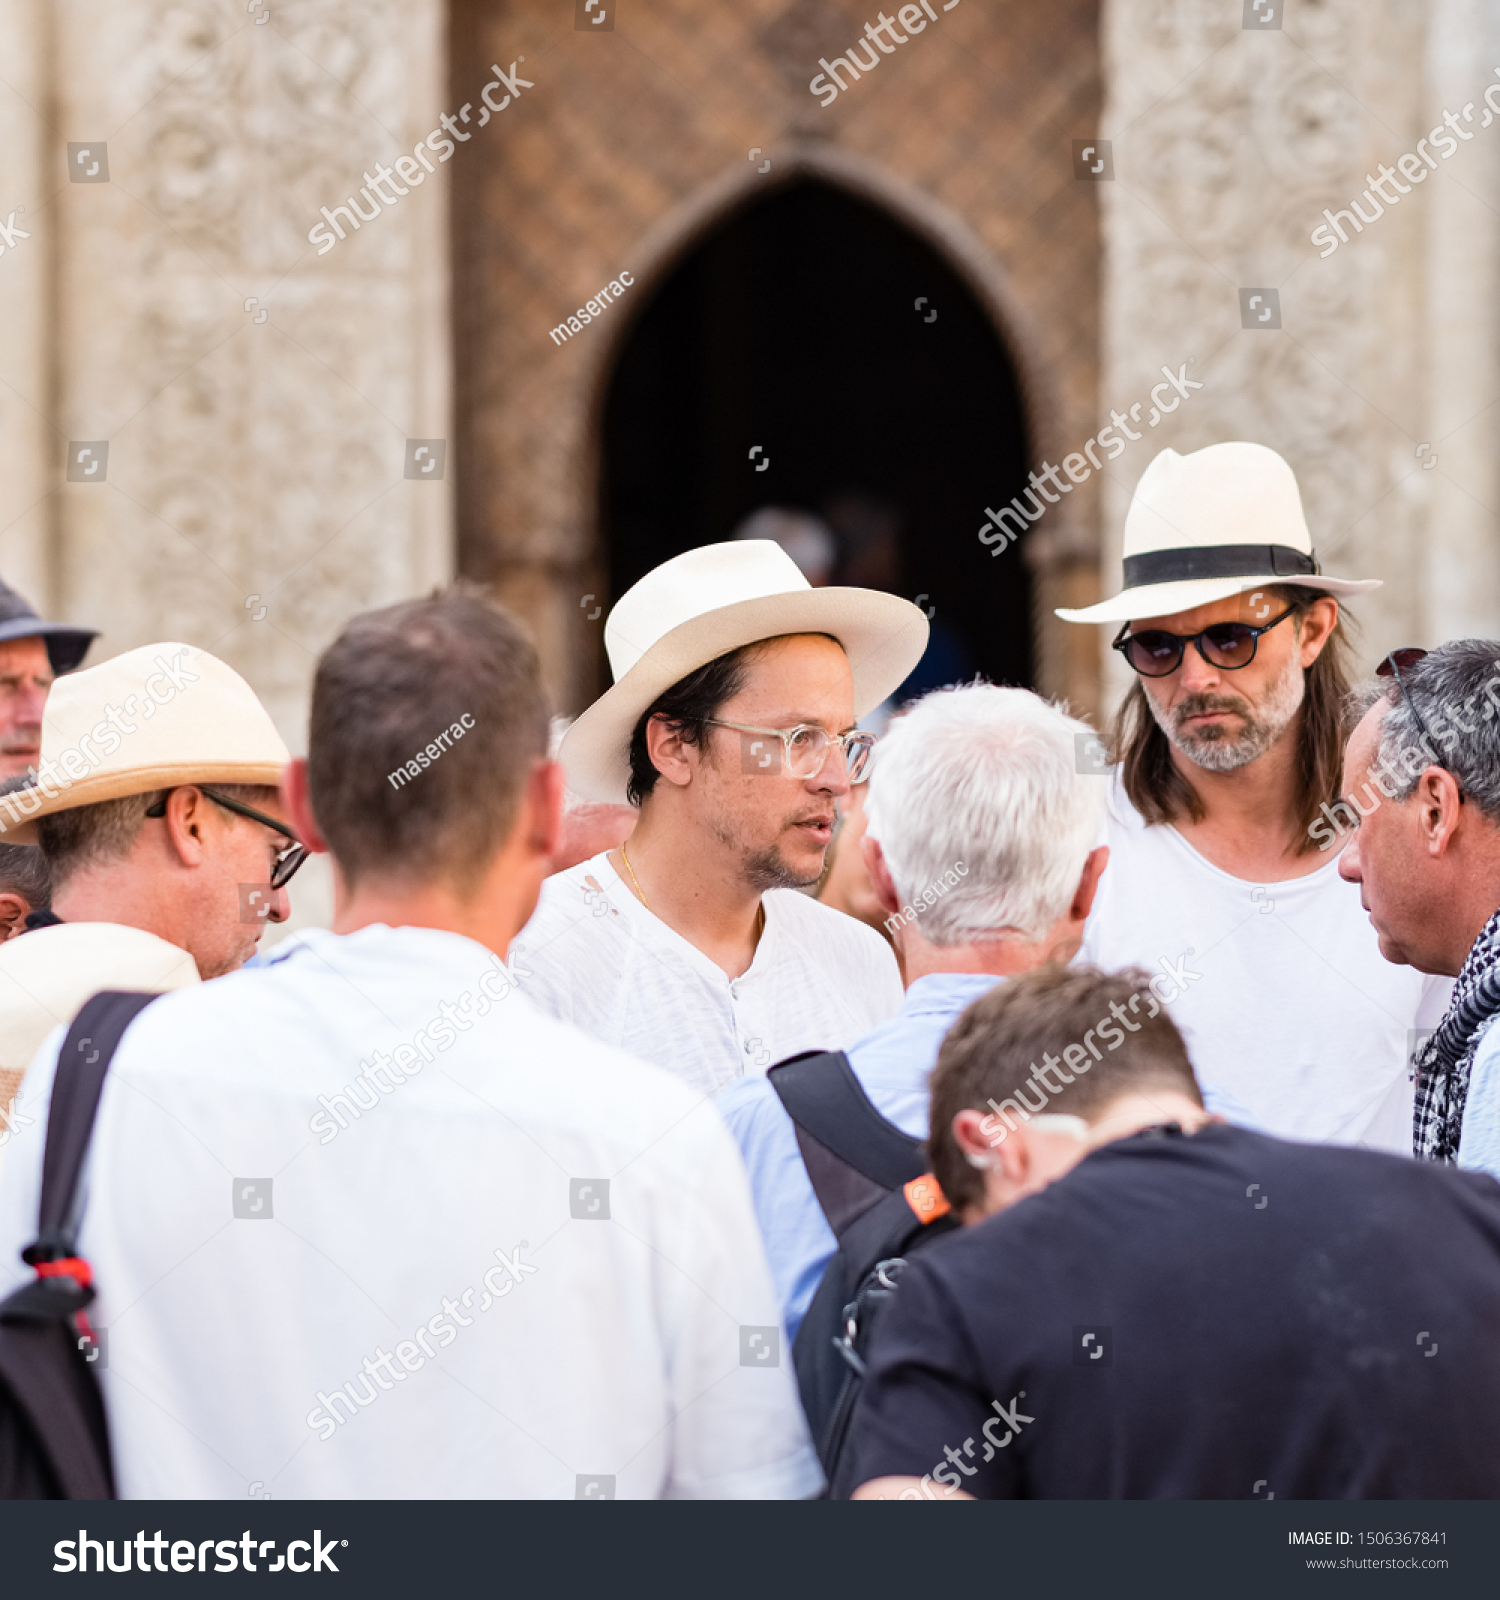 stock-photo-matera-september-bond-director-cary-joji-fukunaga-during-a-briefing-on-the-set-of-1506367841.jpg